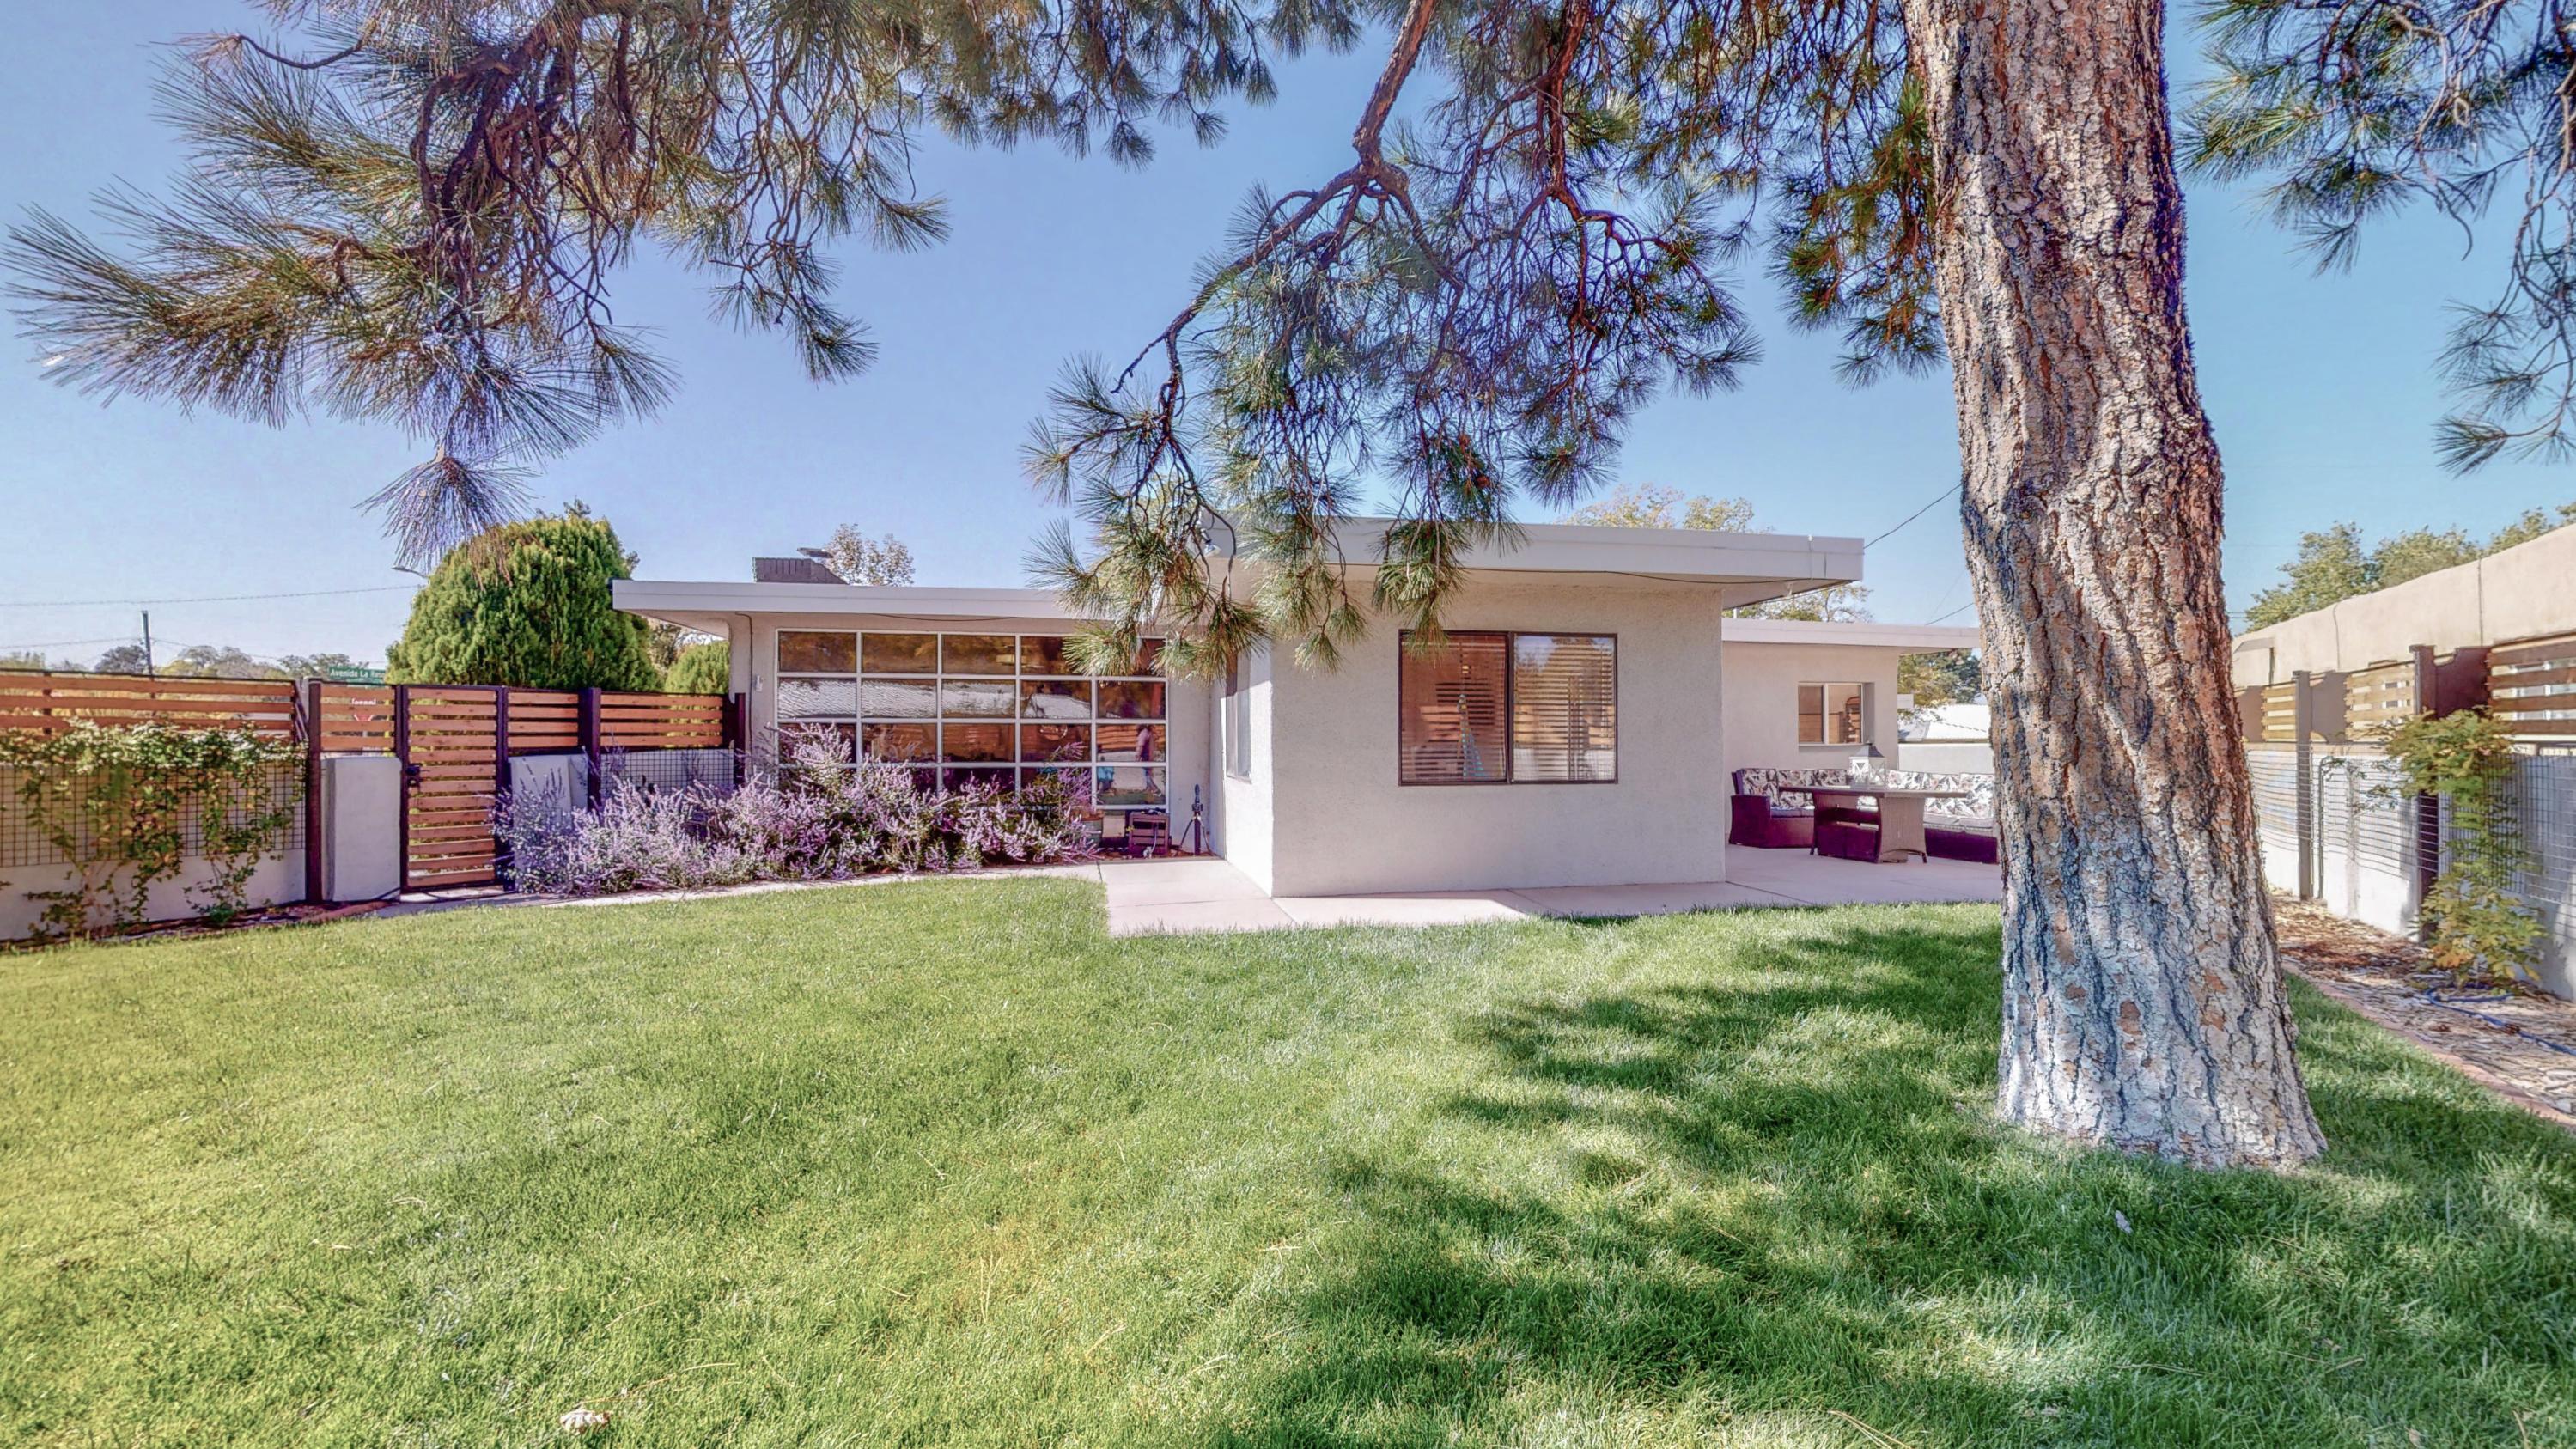 4001 AVENIDA LA RESOLANA NE Property Photo - Albuquerque, NM real estate listing